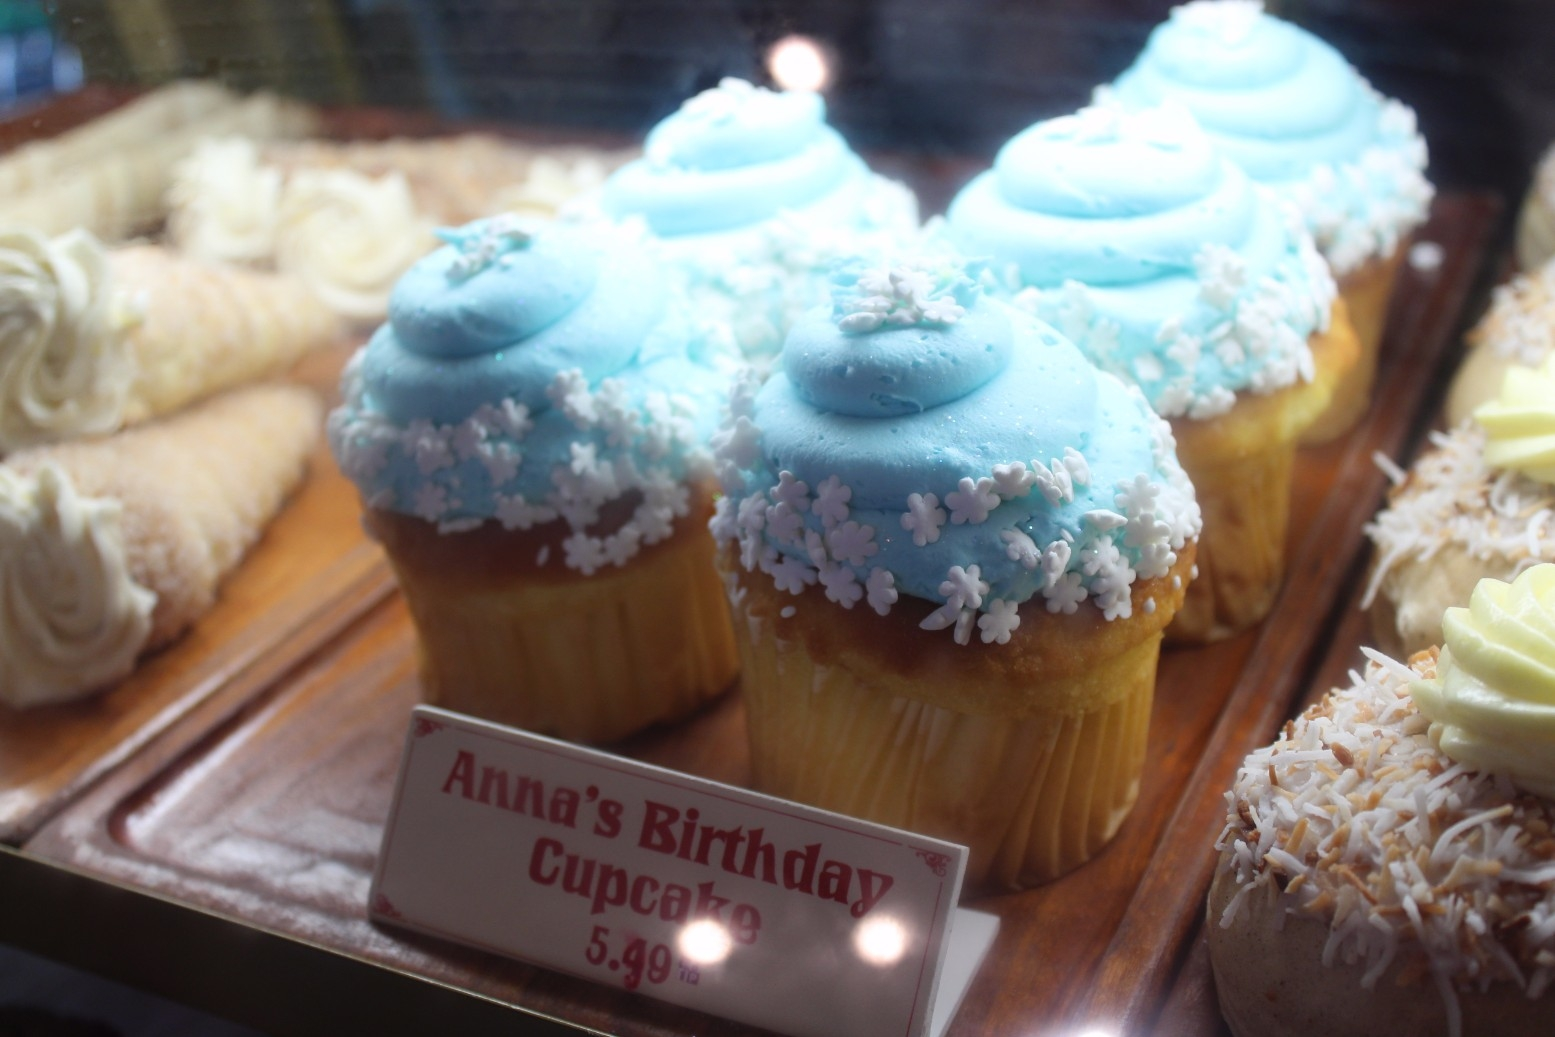 Anna\'s birthday cupcake Norway Bakery Epcot (1)